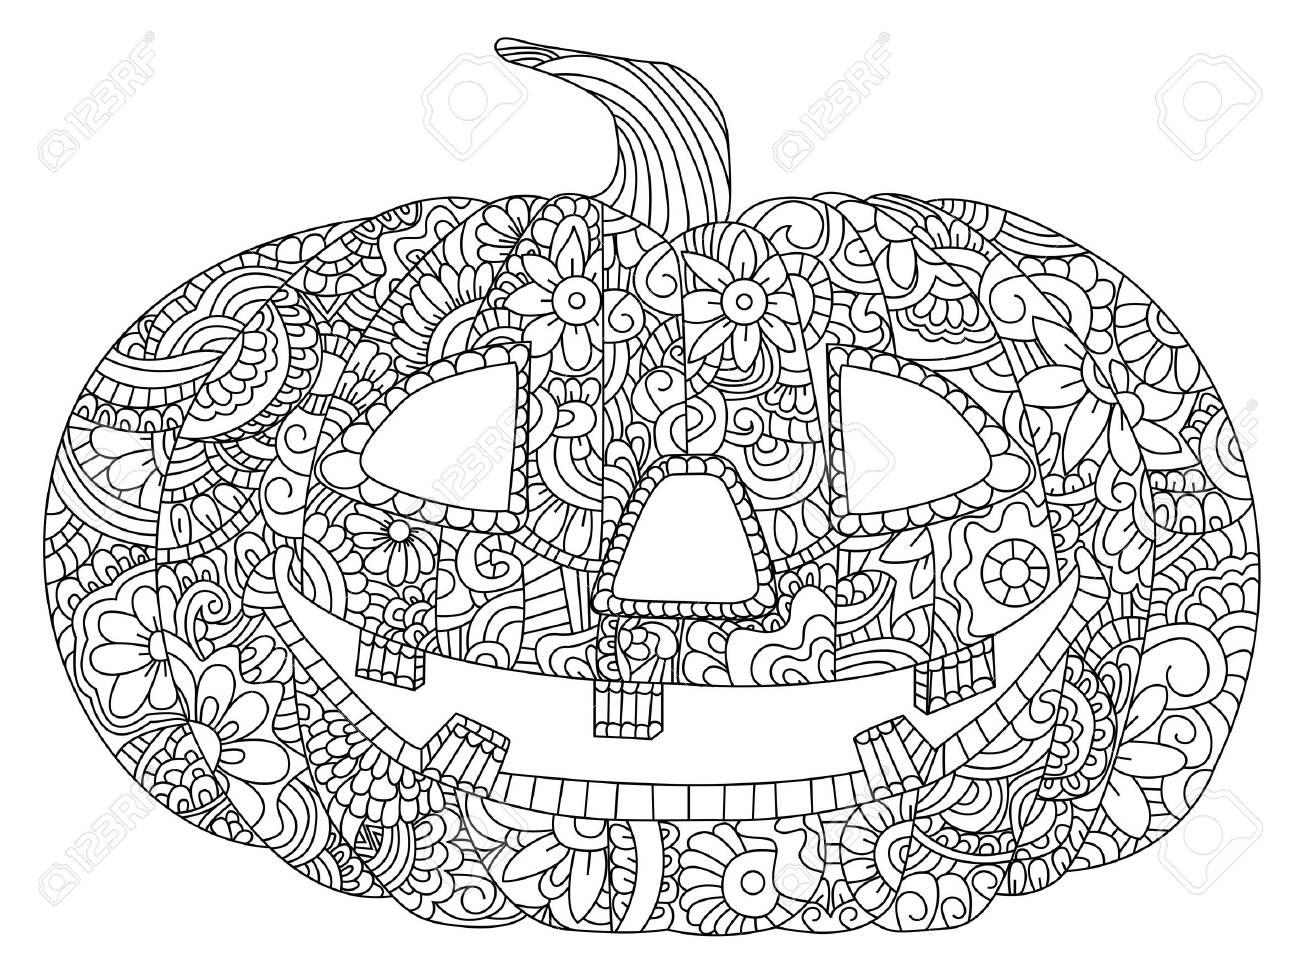 Pumpkin For Halloween Coloring Book Vector Illustration. Anti-stress ...